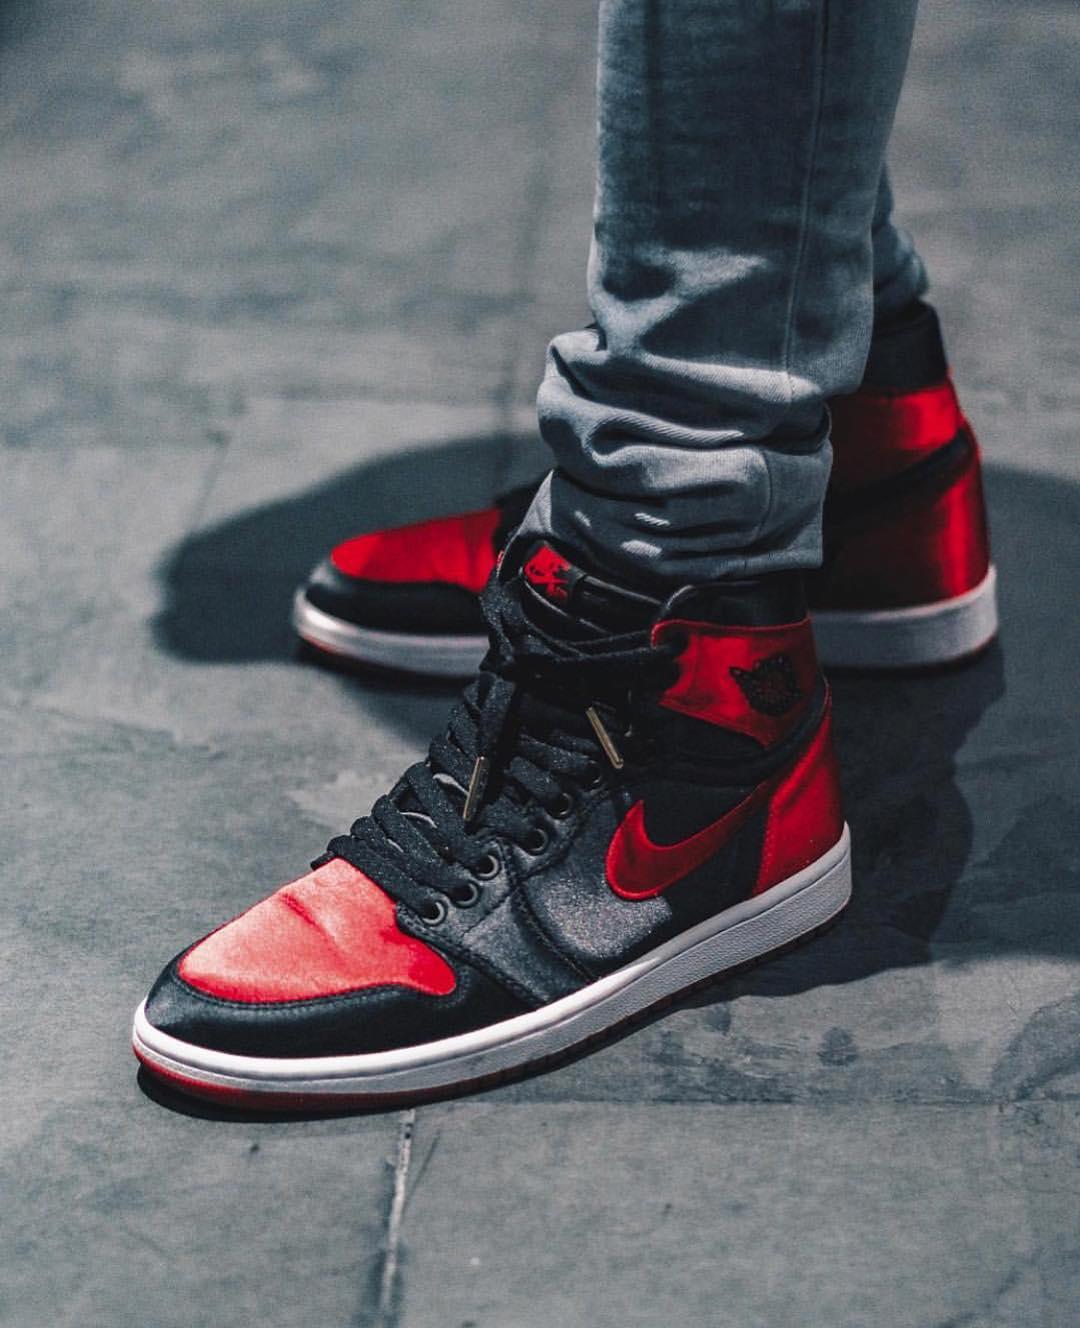 AJ,Air Jordan,Nike,adidas  Sneaker 球鞋玩到最后,都会跳进这个坑!无人幸免!